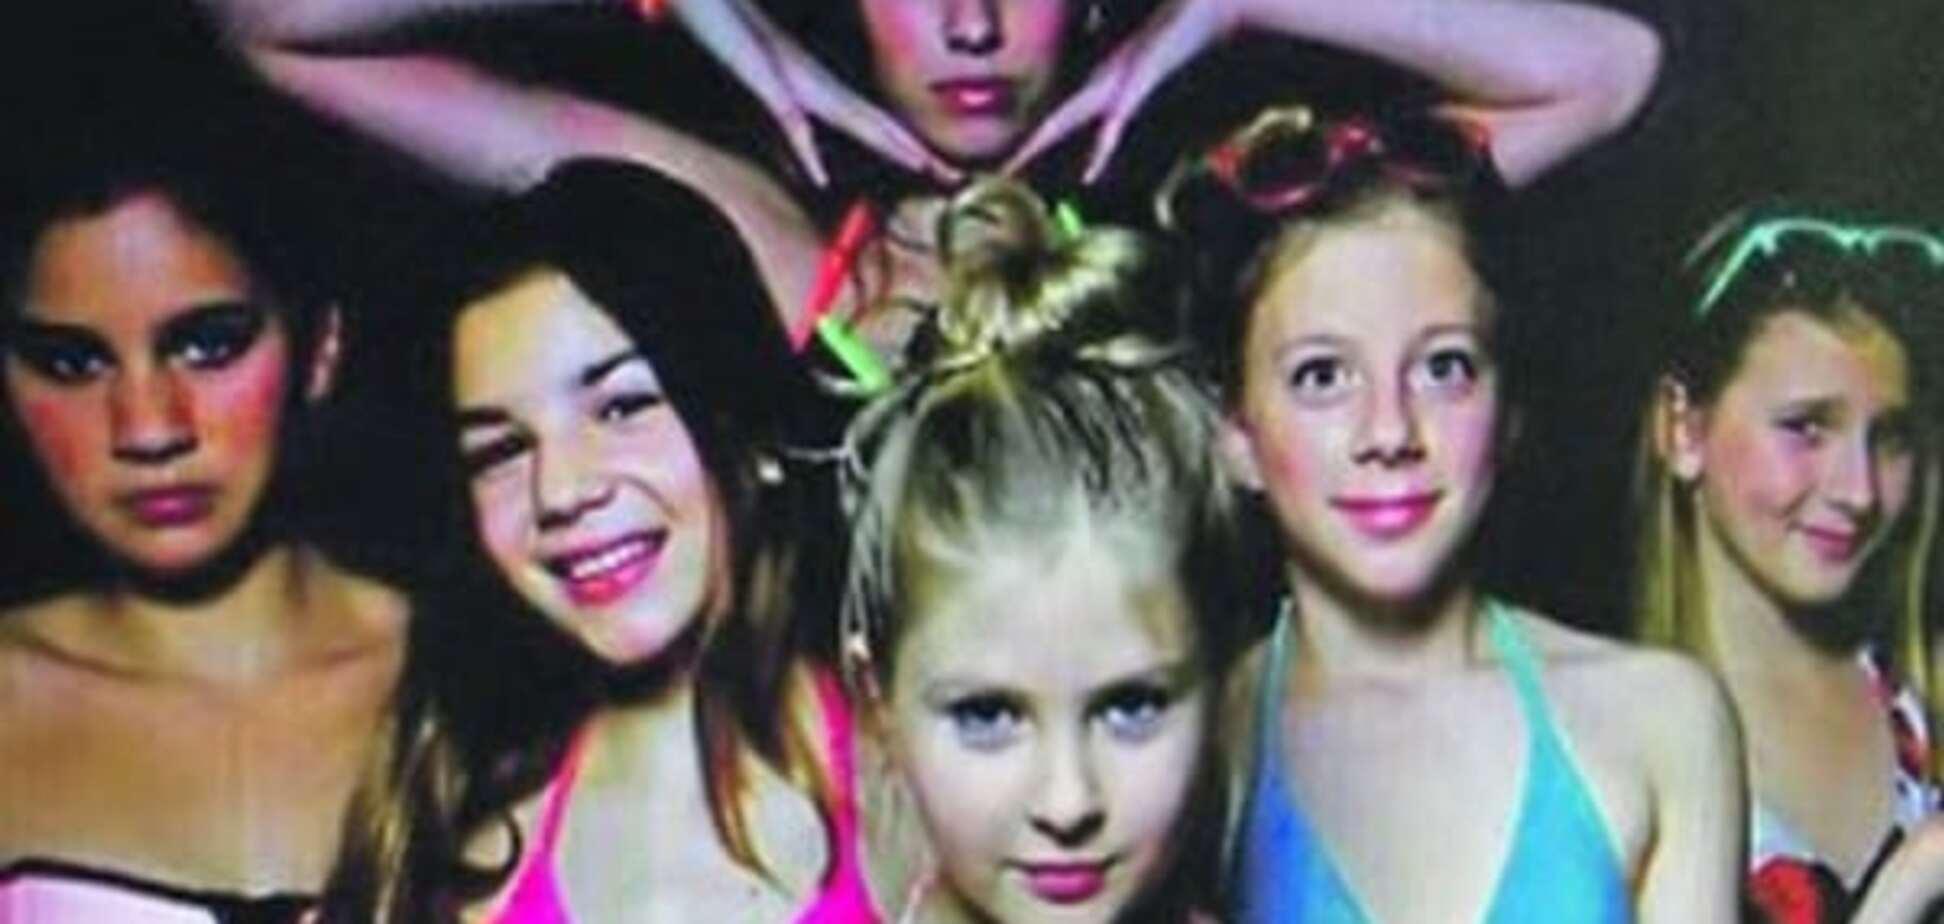 13-річна донька Кличка позувала в купальнику